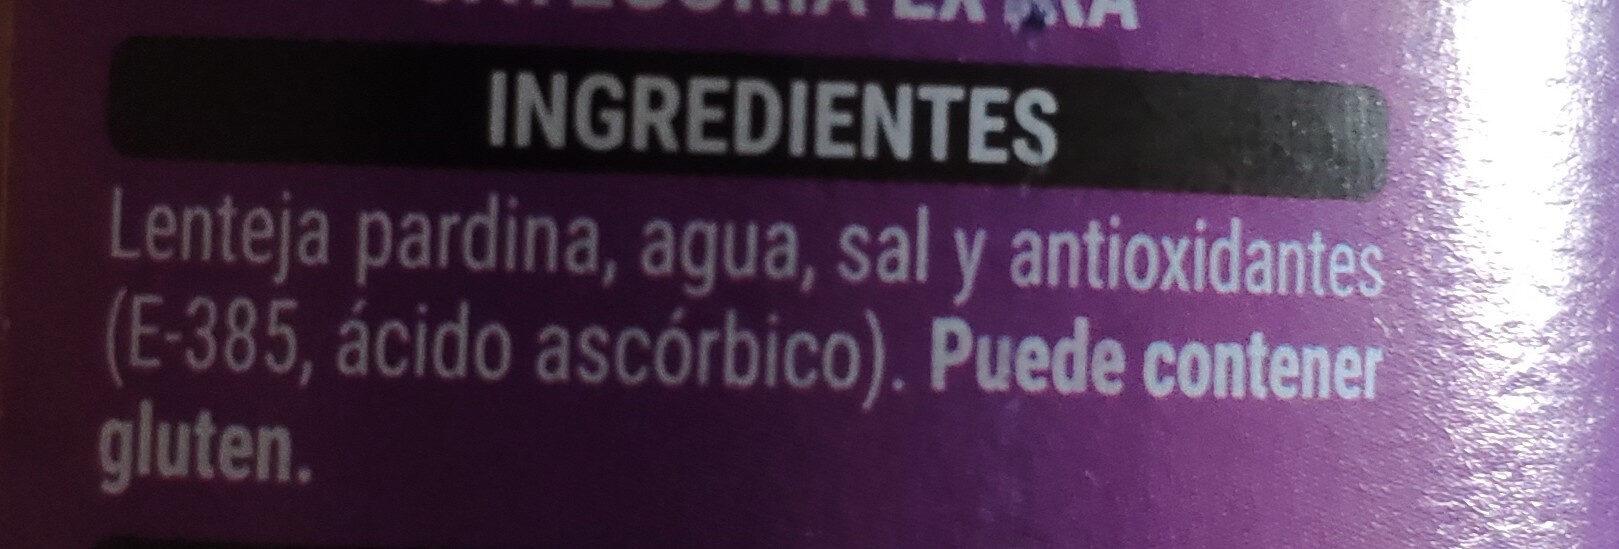 Lenteja pardina - Ingredientes - es